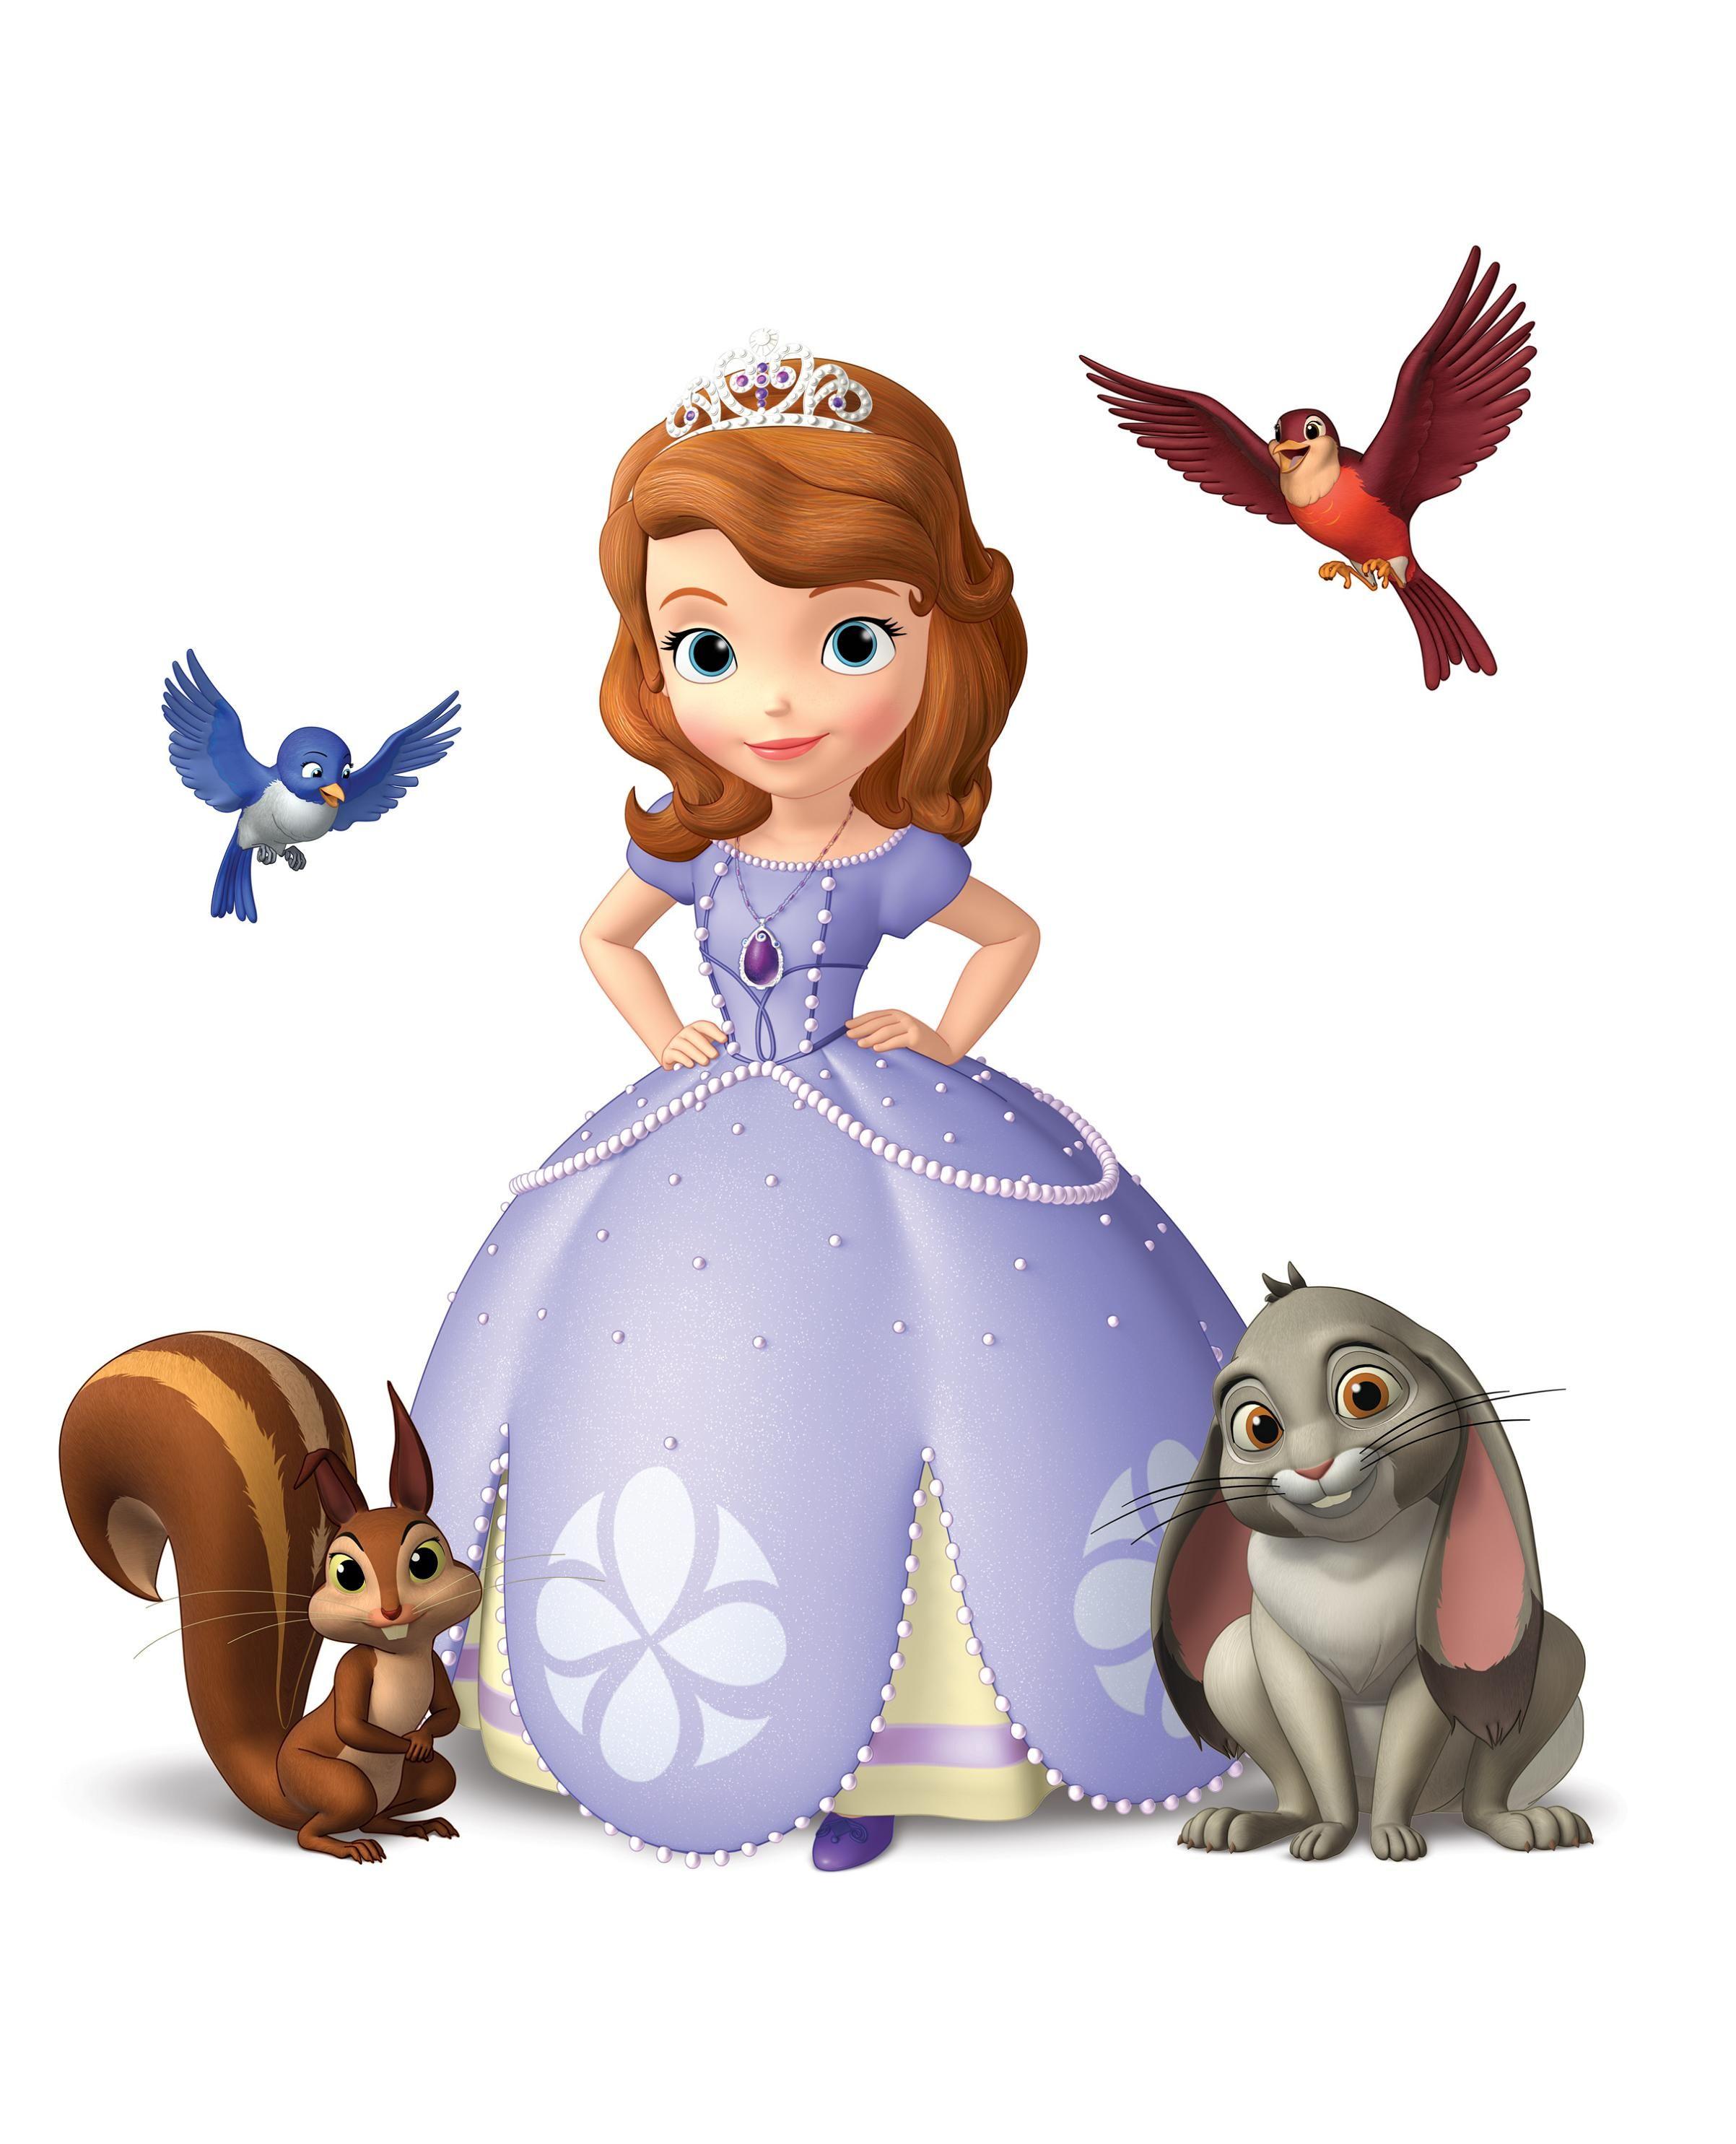 Birthday Party Theme Princesa Sofia Png Princesa Sofía Princesita Sofía